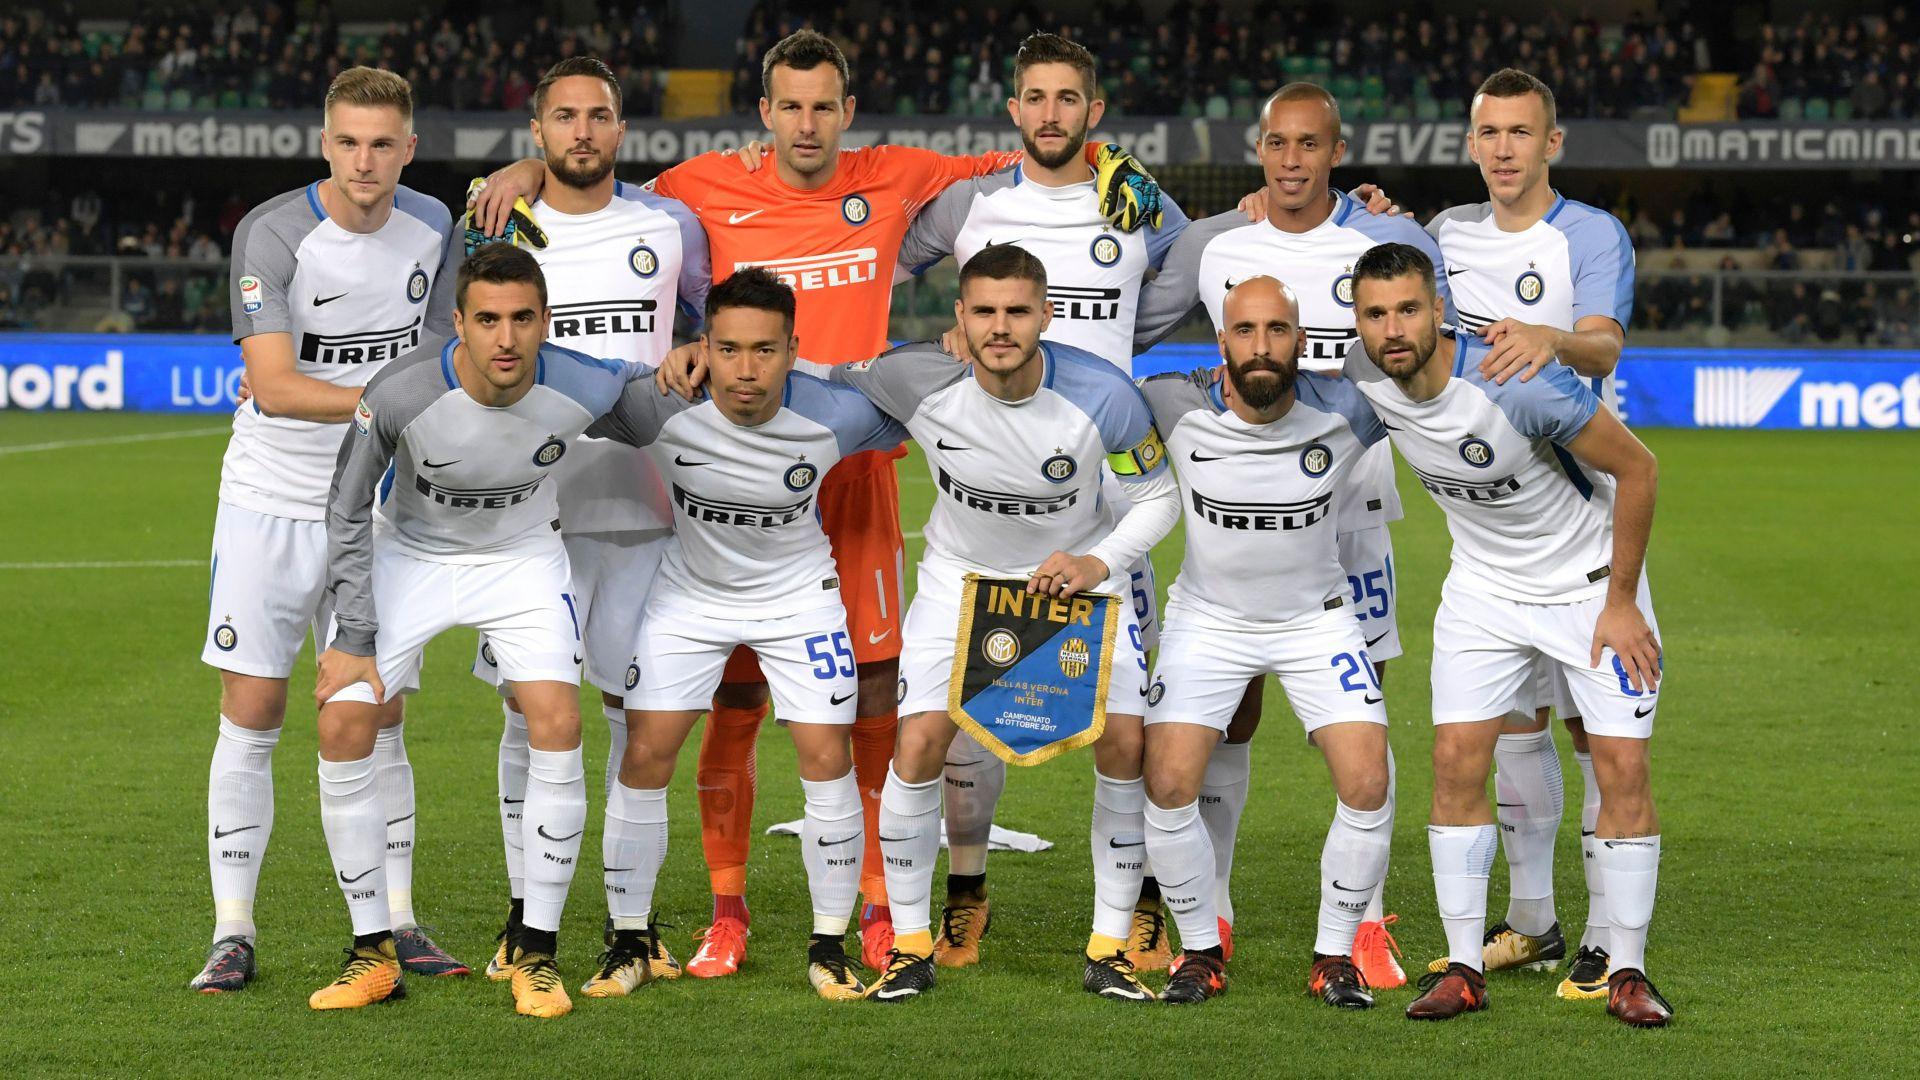 Inter- Serie A